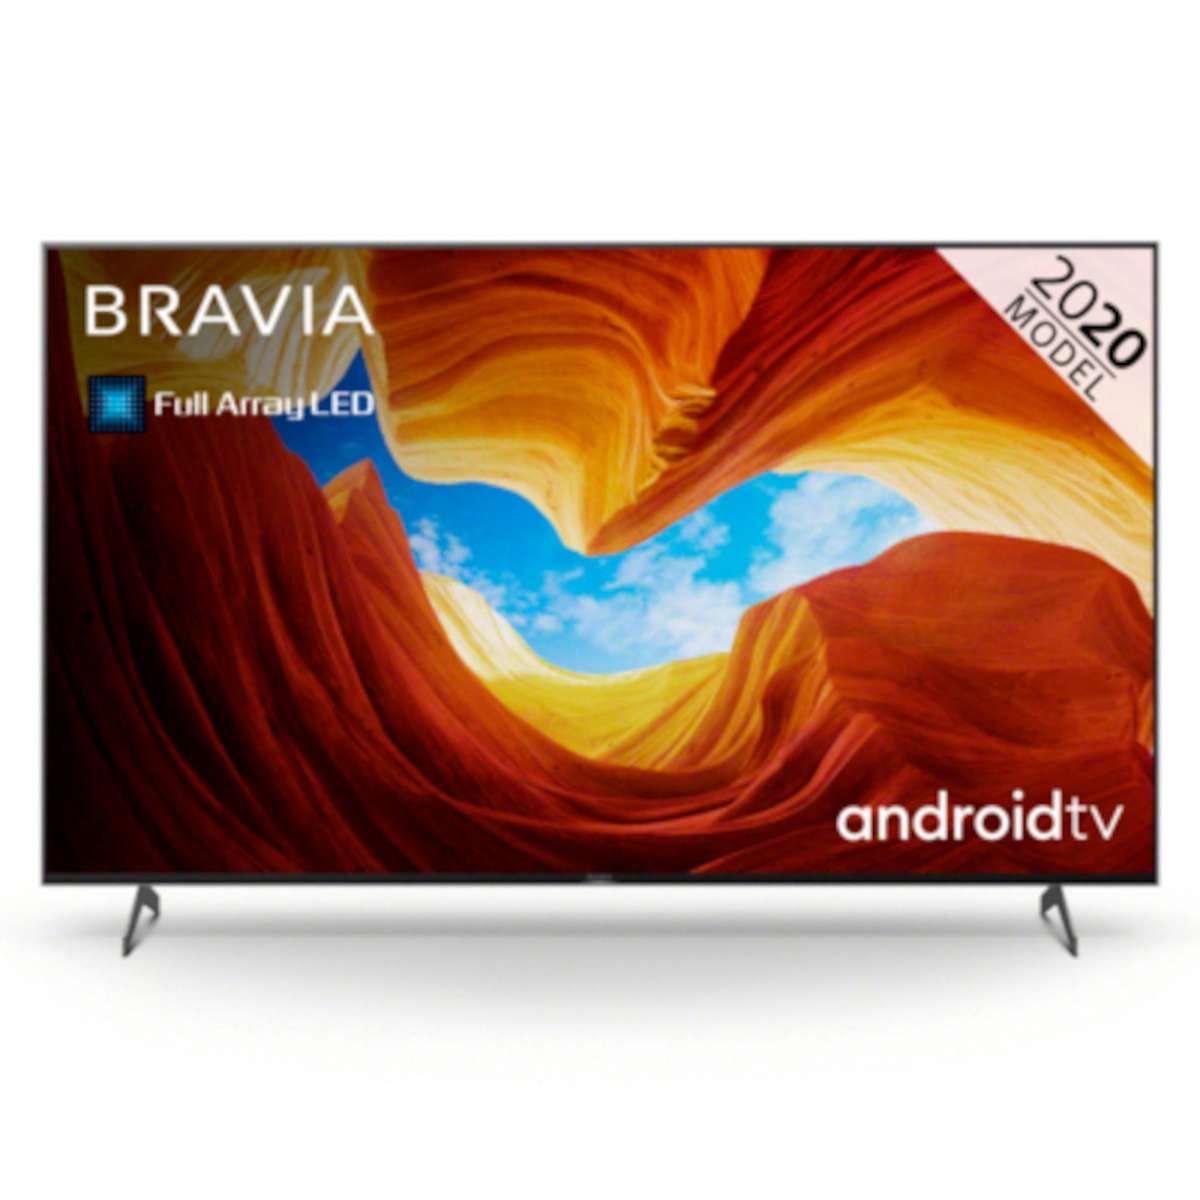 Sony KE65XH9005BU 65 Inch 4K Ultra HD Smart Android TV - £869.89 (Membership Required) @ Costco